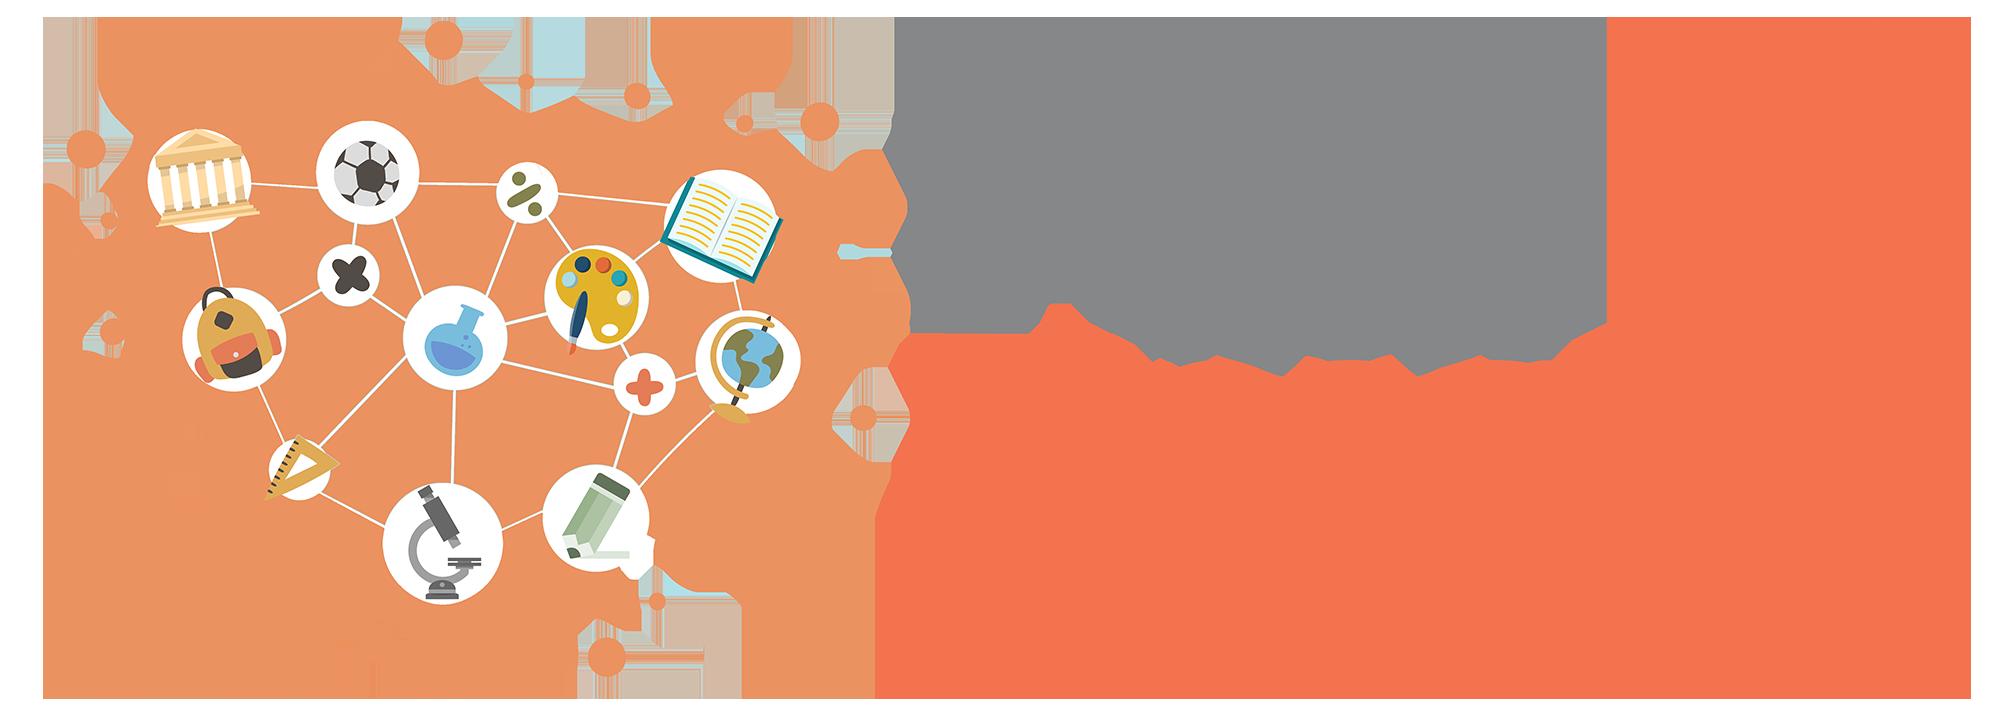 Logo Pibid Unespar